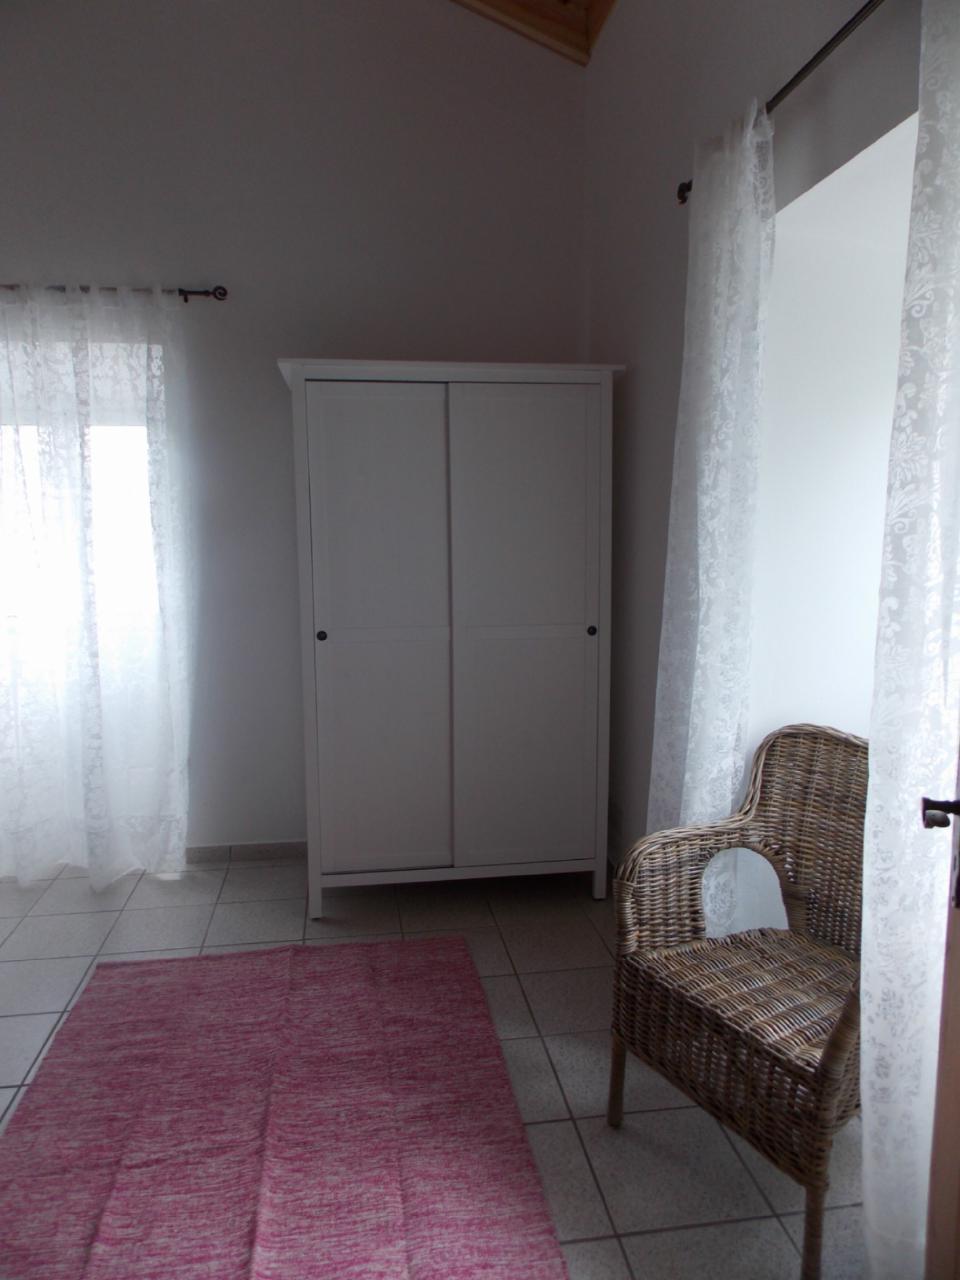 Ferienhaus Casa Bouganvillea (2074452), Ginetes, Sao Miguel, Azoren, Portugal, Bild 13